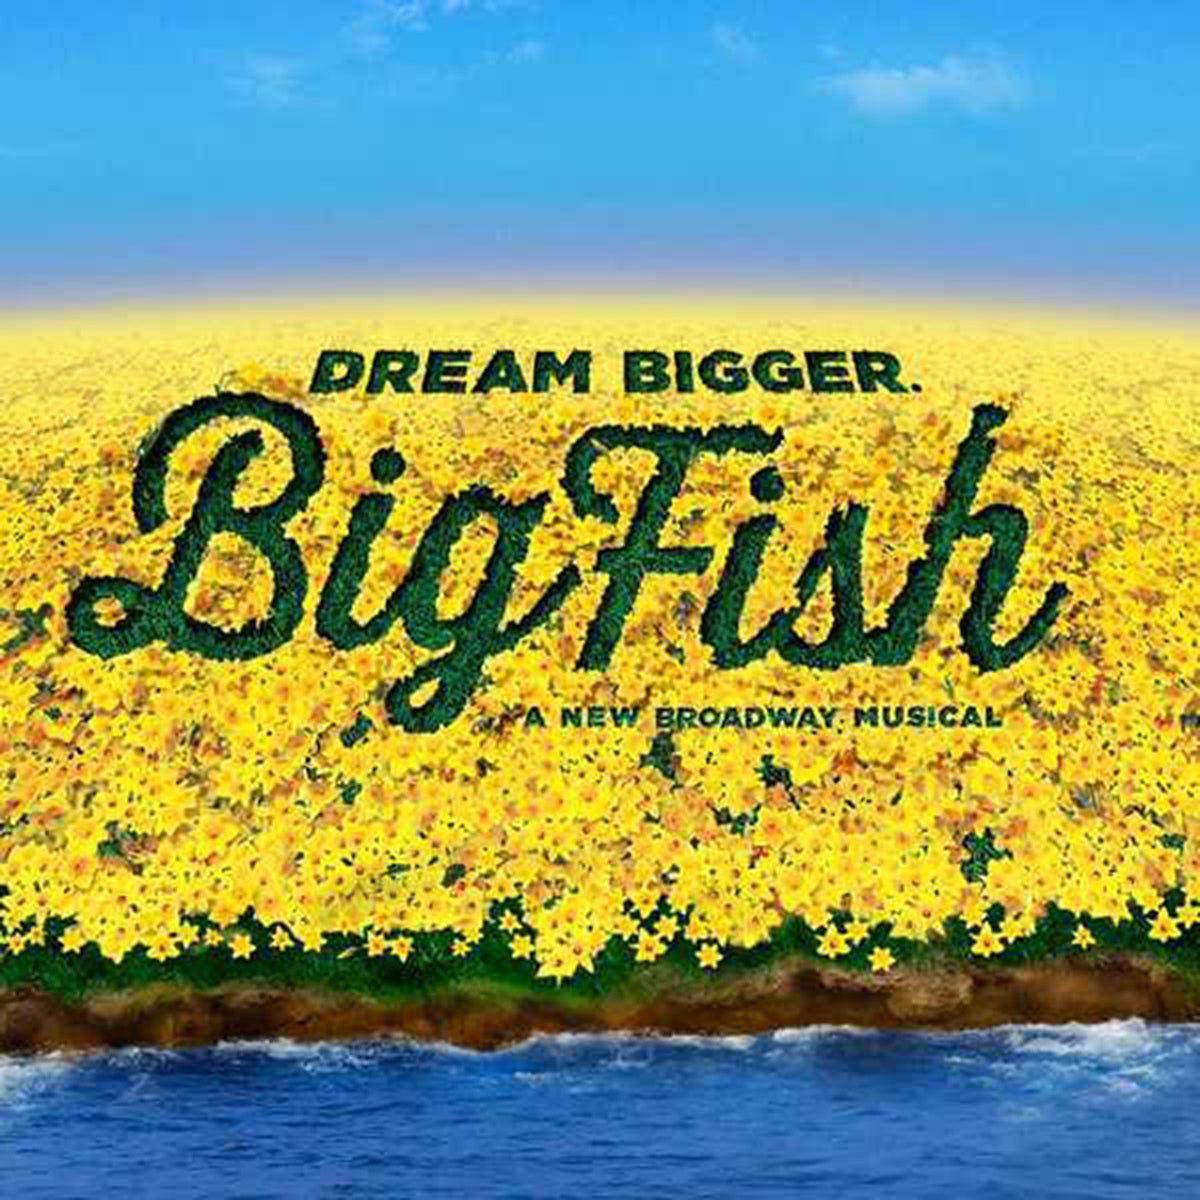 Big Fish, Outcry Youth Theatre